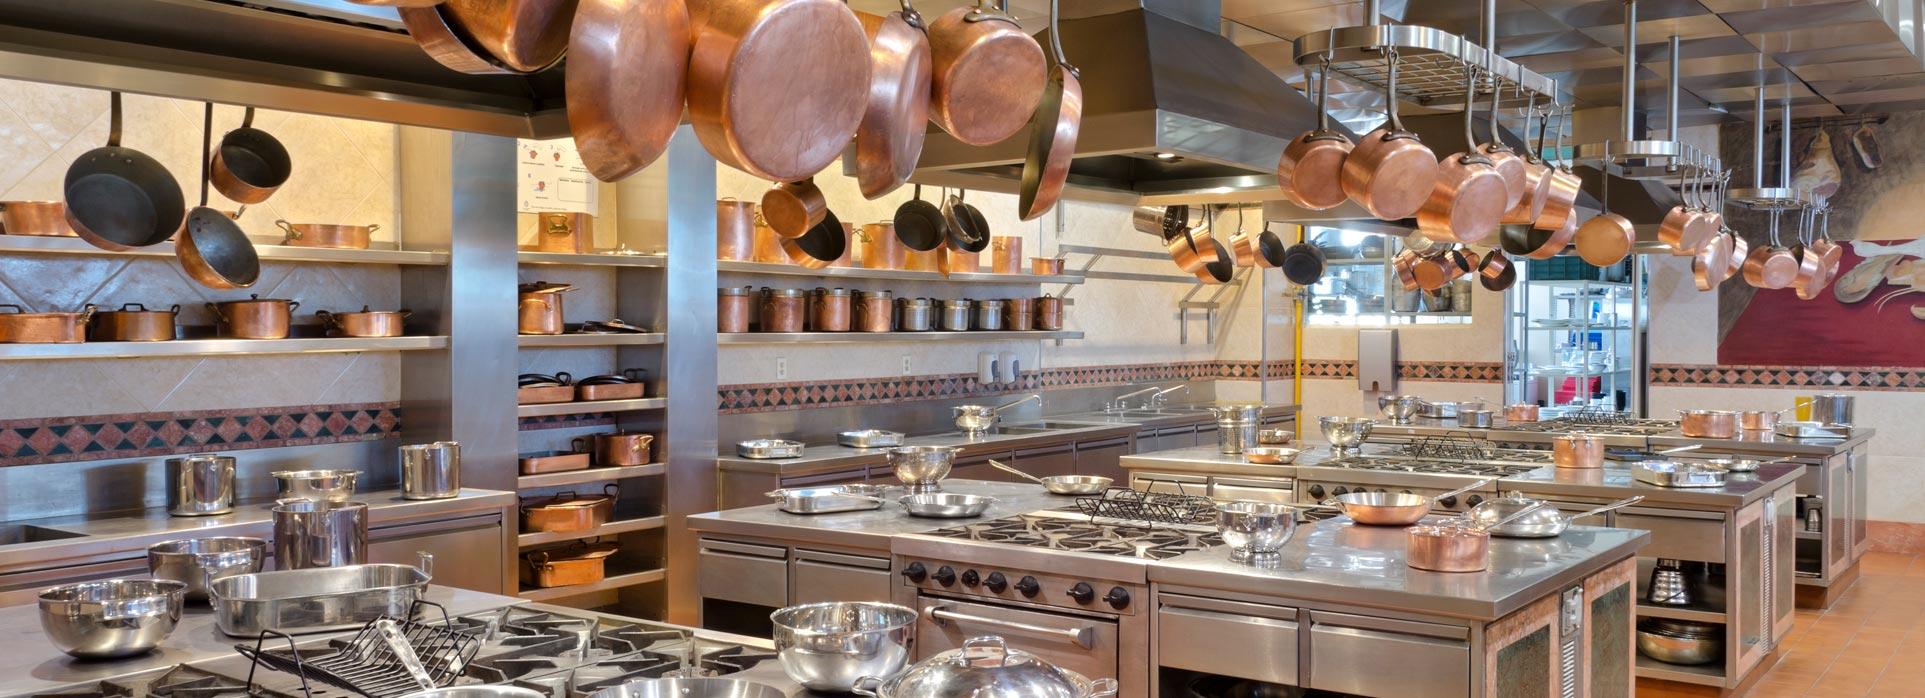 Monas équipement et fourniture de restaurants